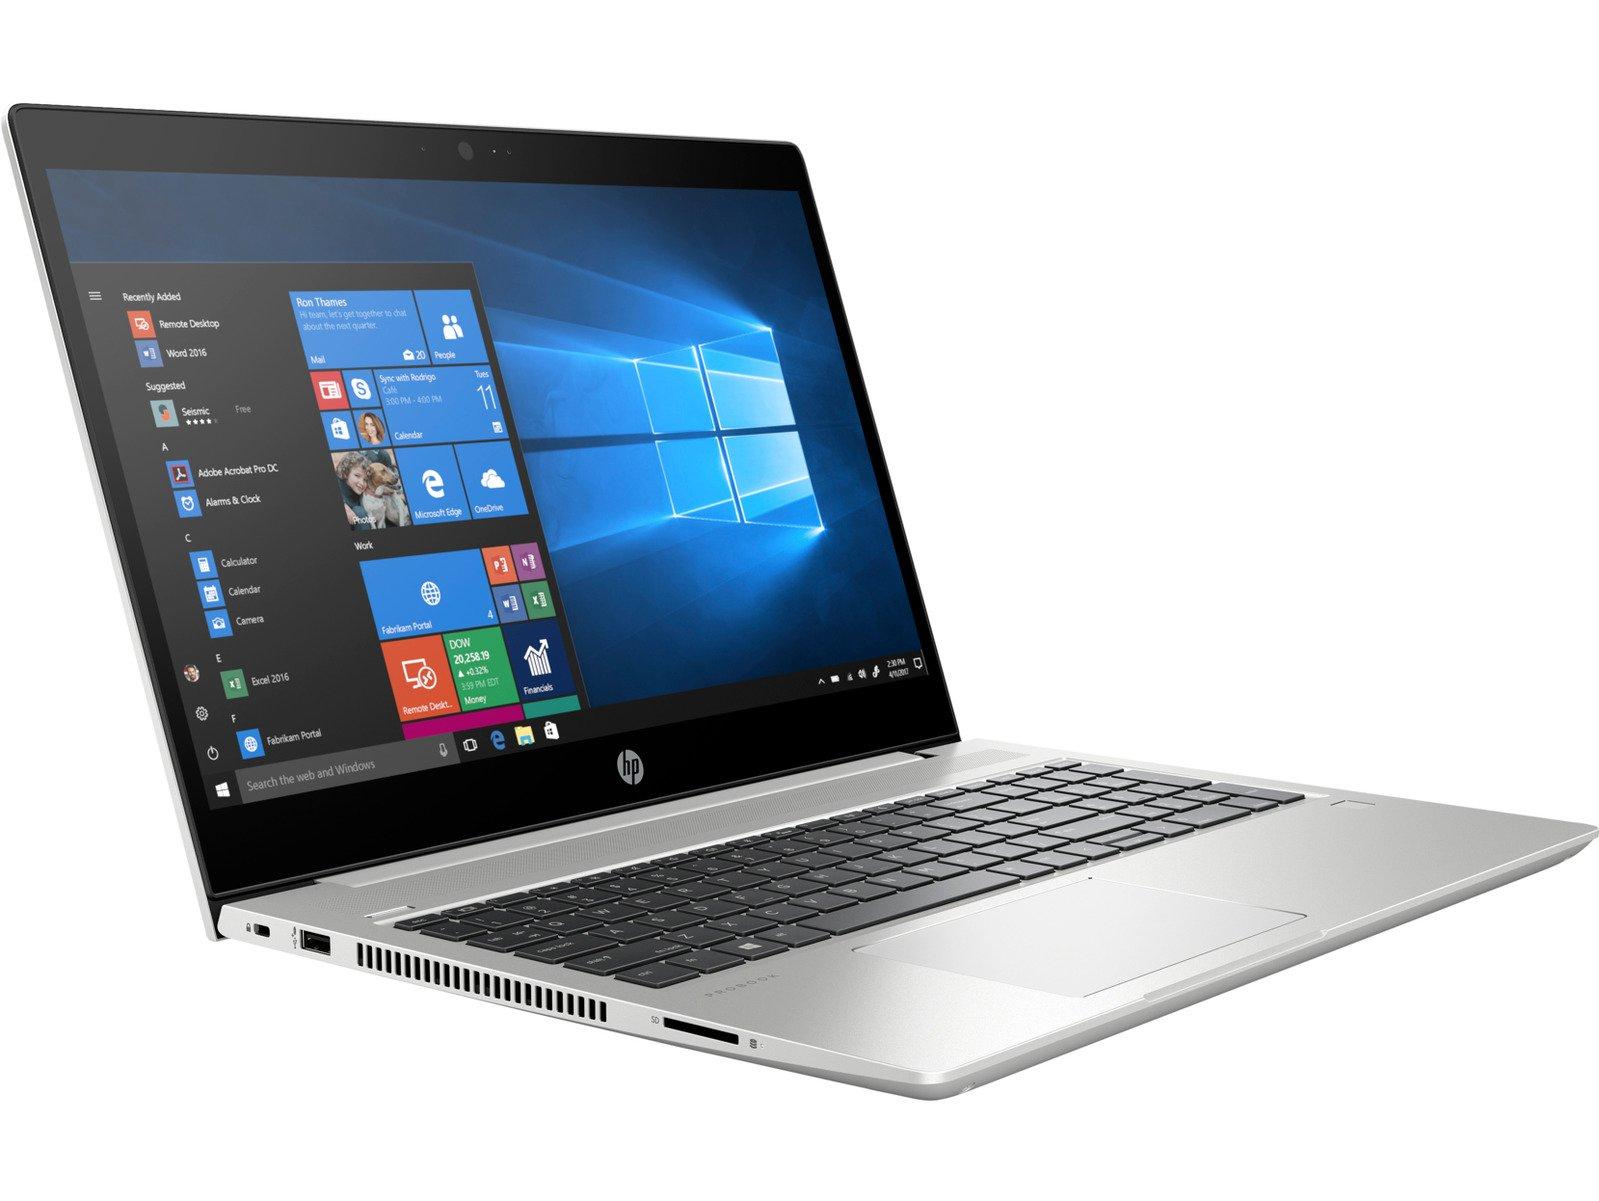 "HP ProBook 450 G6 (15.6"", IPS, FHD, 220cd/m², i7-8565U, 8GB RAM, 256GB PCIe SSD, MX130 2GB, HDMI 1.4, USB-C + DP & PD, 45Wh, Win10 Pro)"